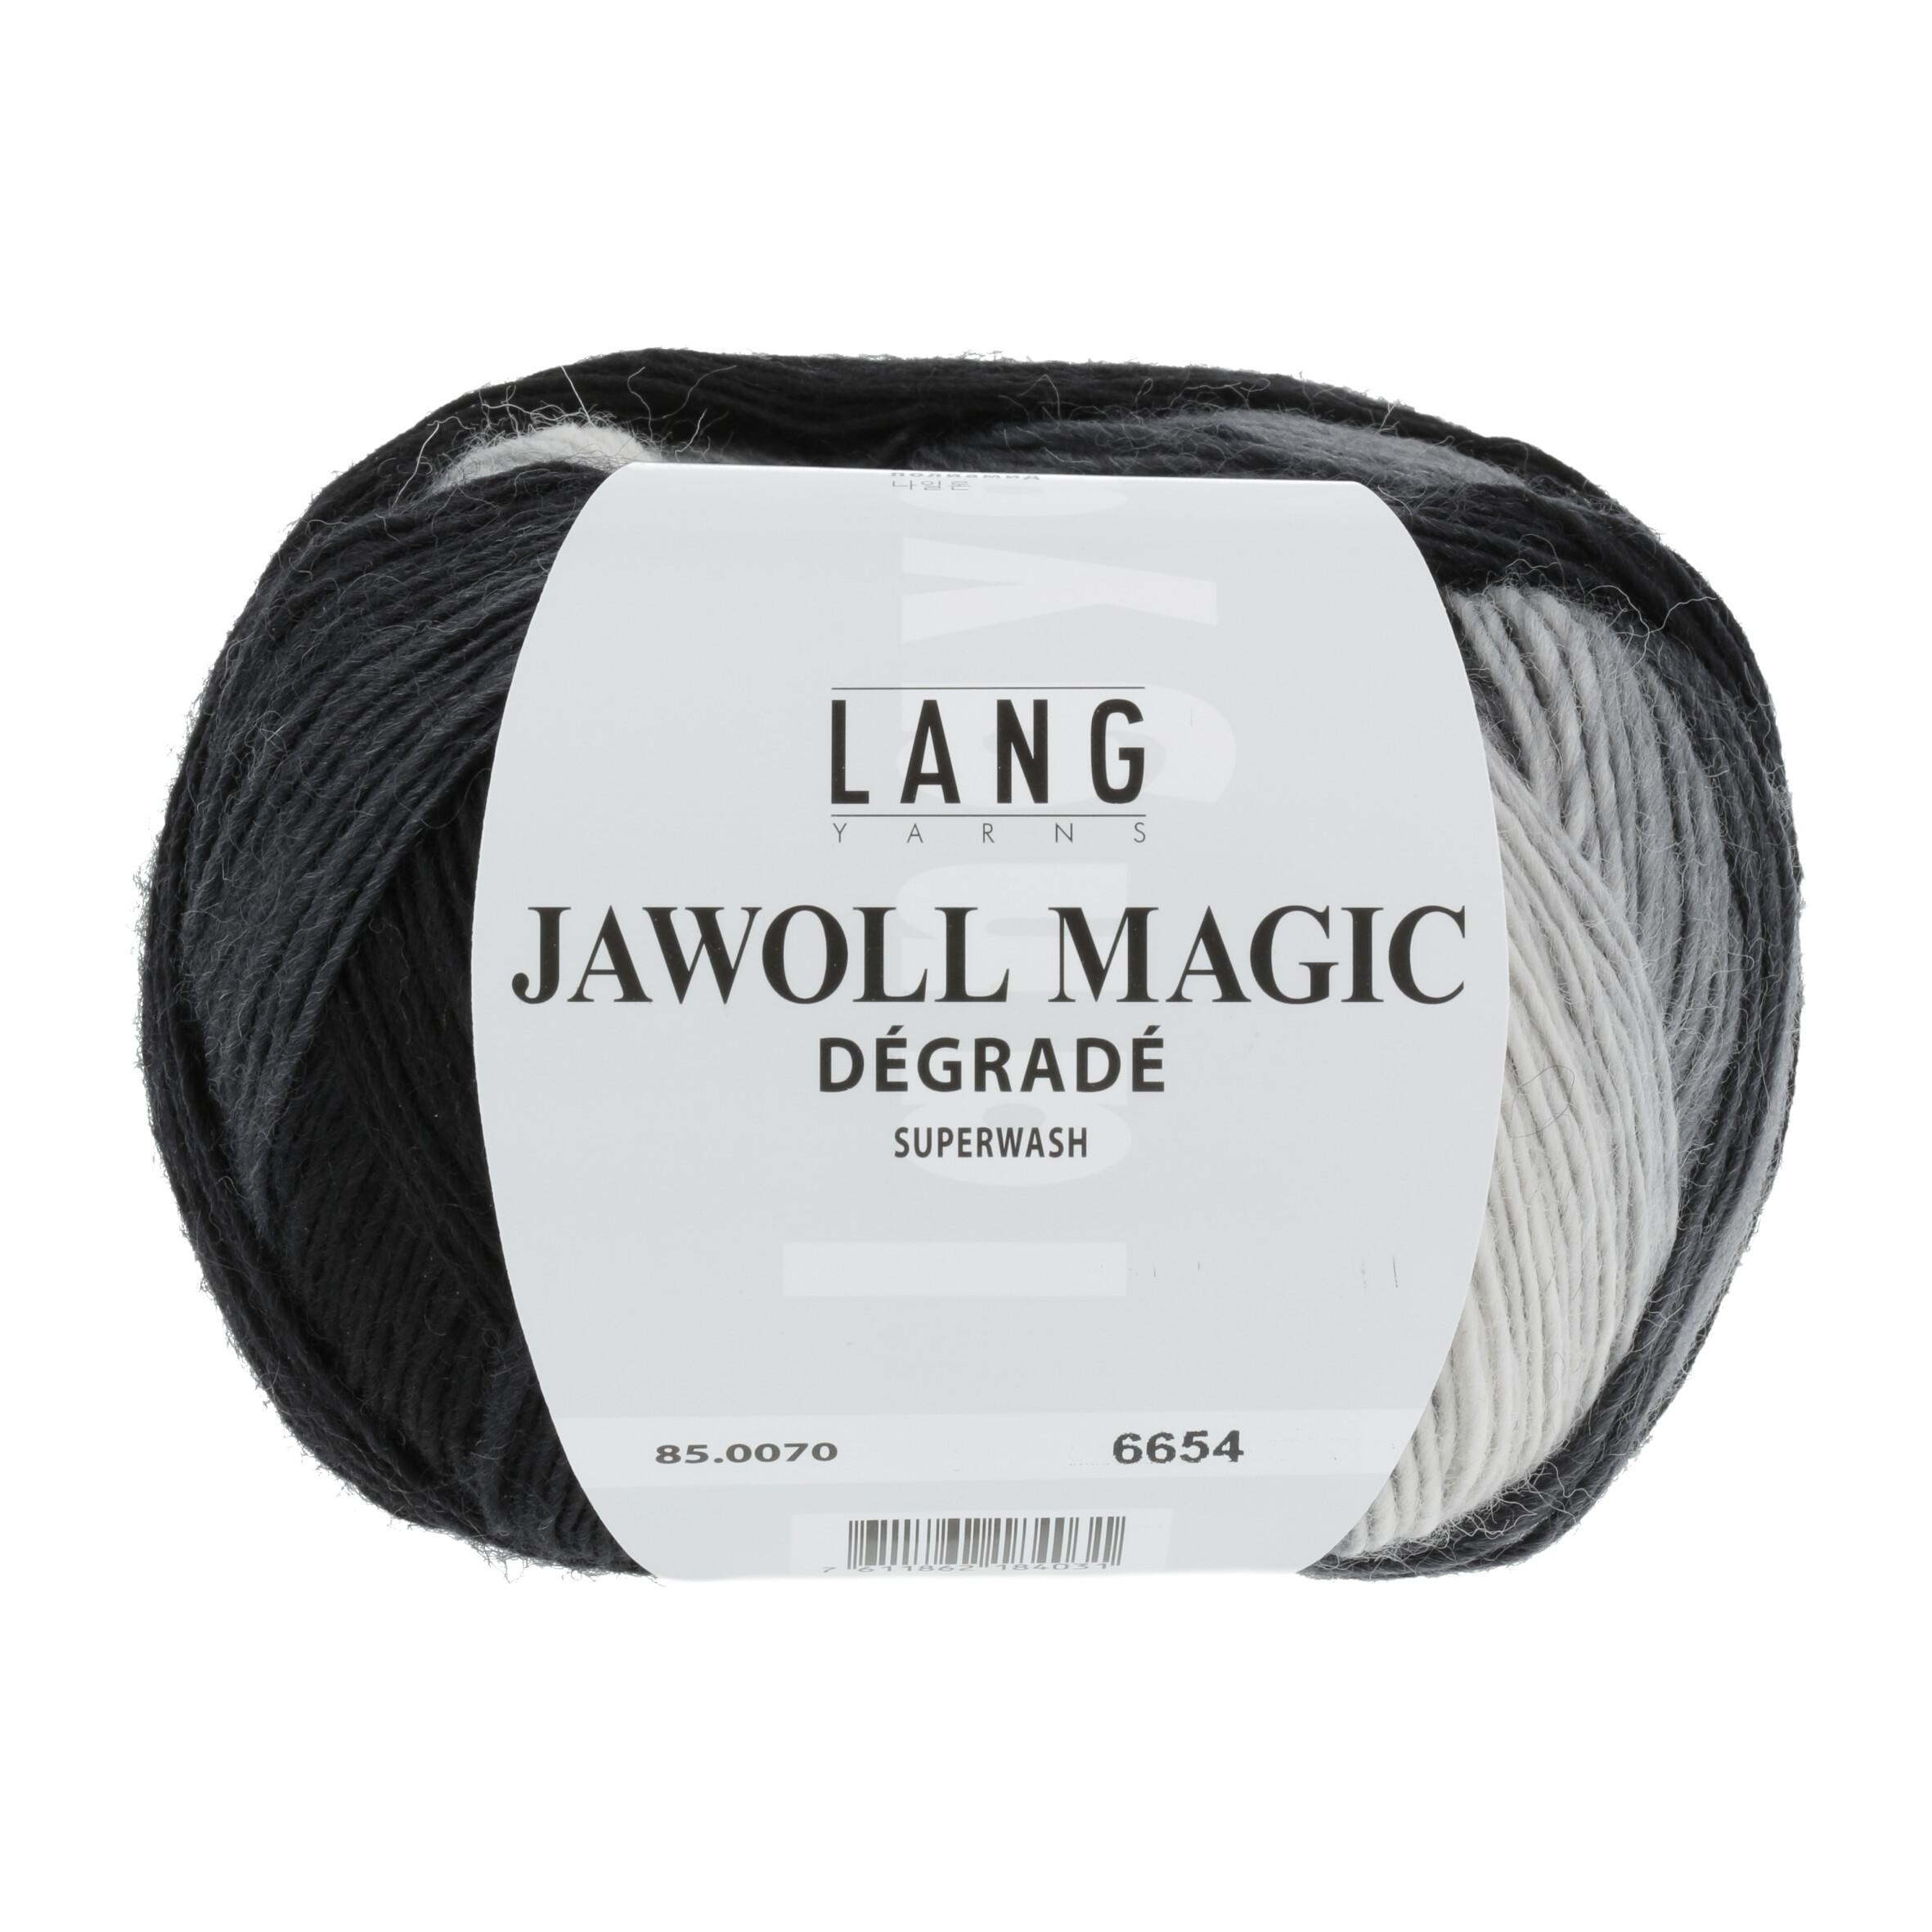 Jawoll Magic Dégrade